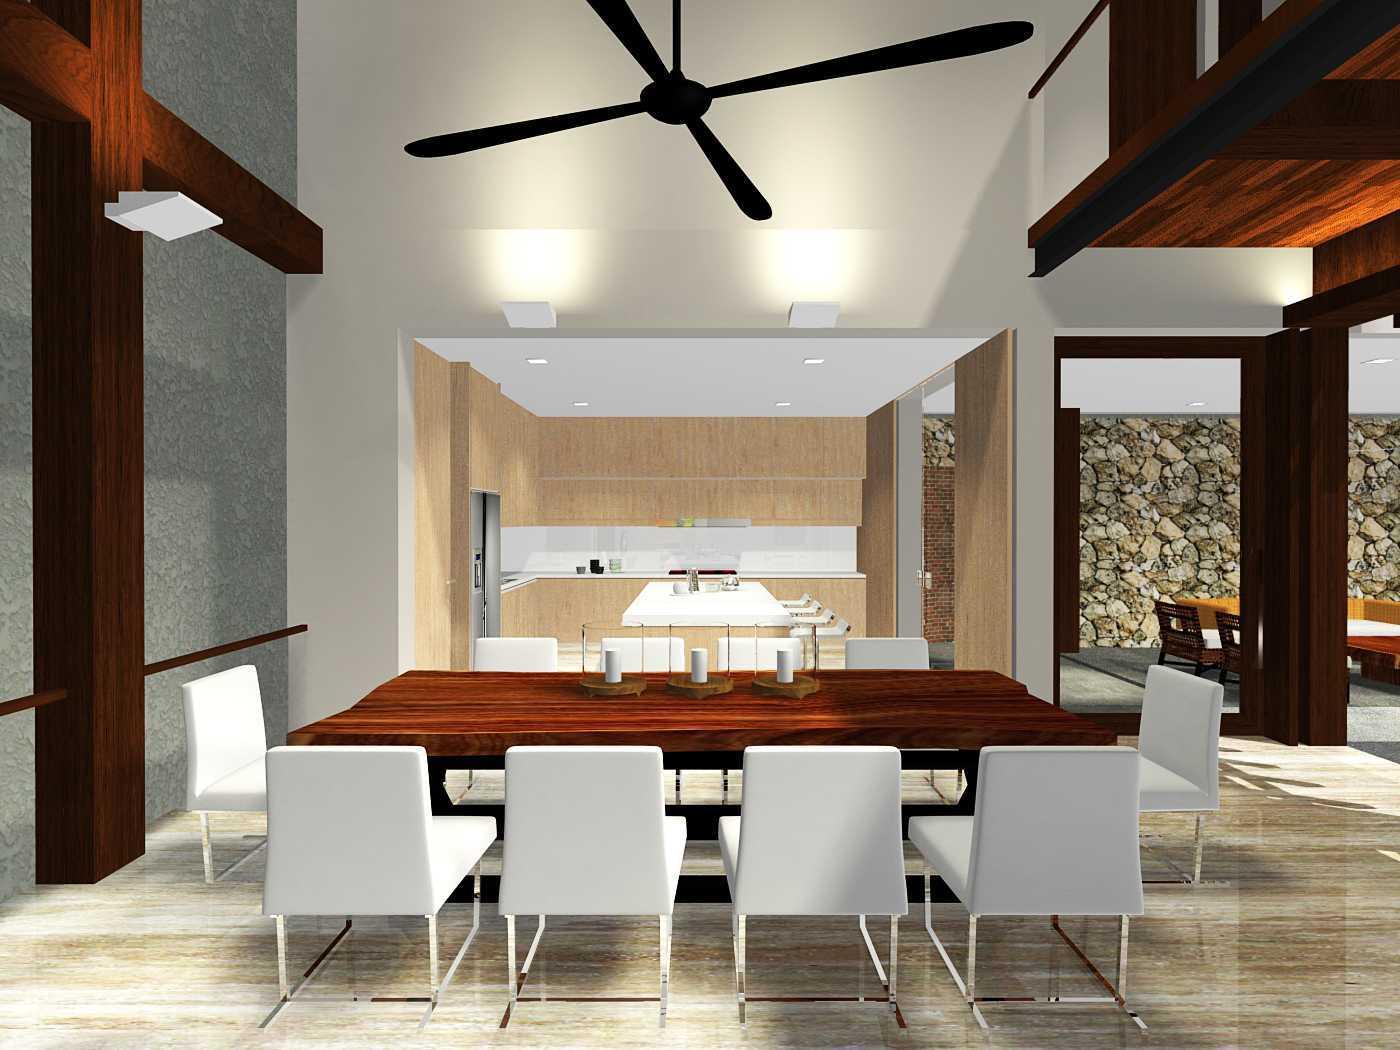 Herryj Architects Katamaran House Jakarta, Indonesia Jakarta, Indonesia 8Dining Tropis 23861